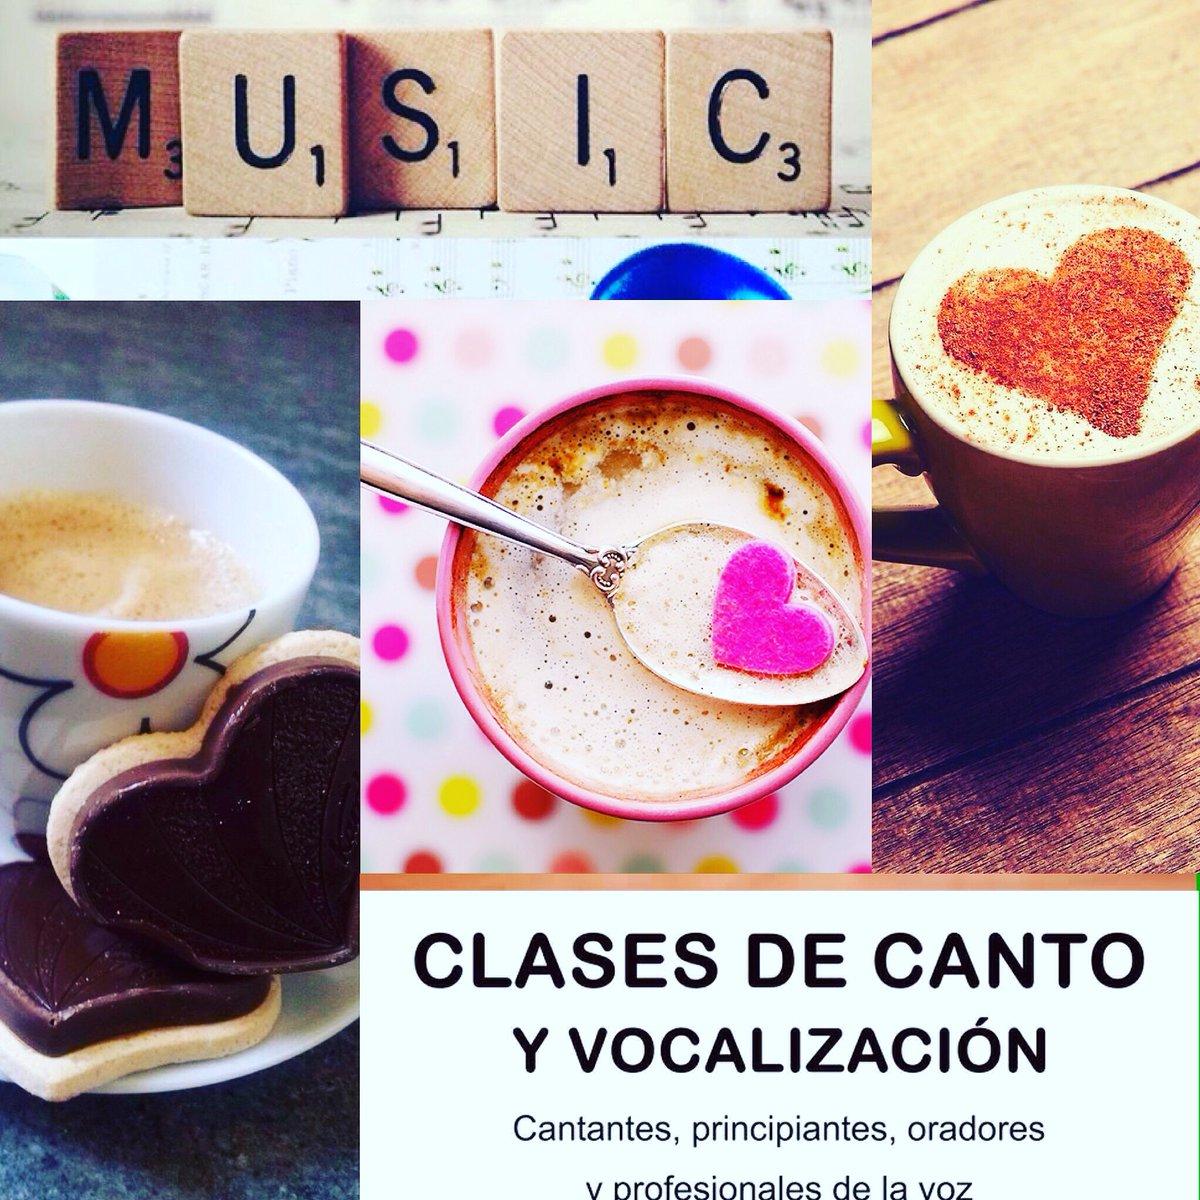 Buenos días!!!  Tareas varias Un poco de Gym y  Clases on line a las 10.00 hs  A moverse!!!! :)) 🎶🎶🎶  #music #online #singer #voice #tech #breathe  #teacher #songwriter #classes #cantar #vocals  #coach #love #life #style #smile #malaga #marbella  #spain #picoftheday